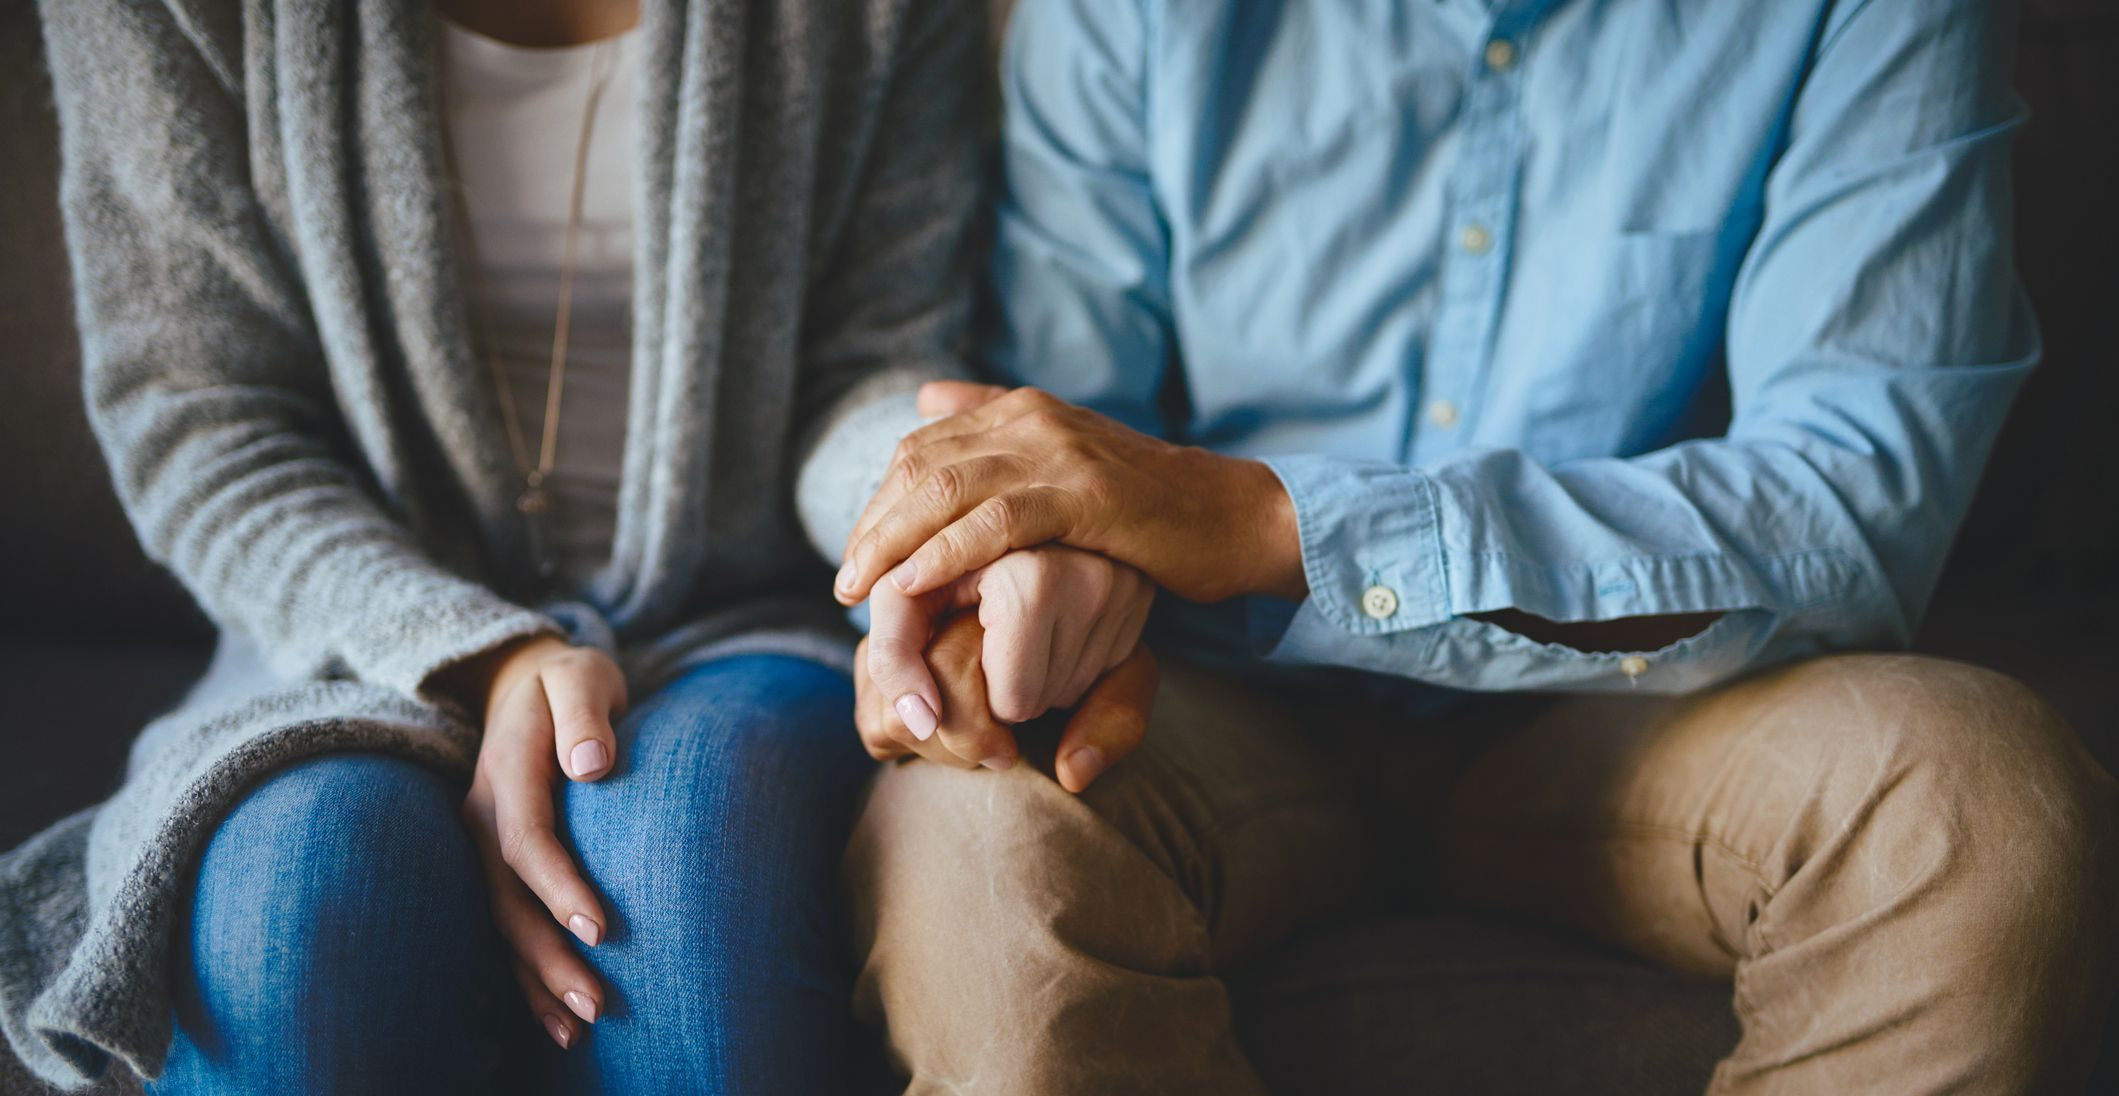 اتمام رابطه عاشقانه